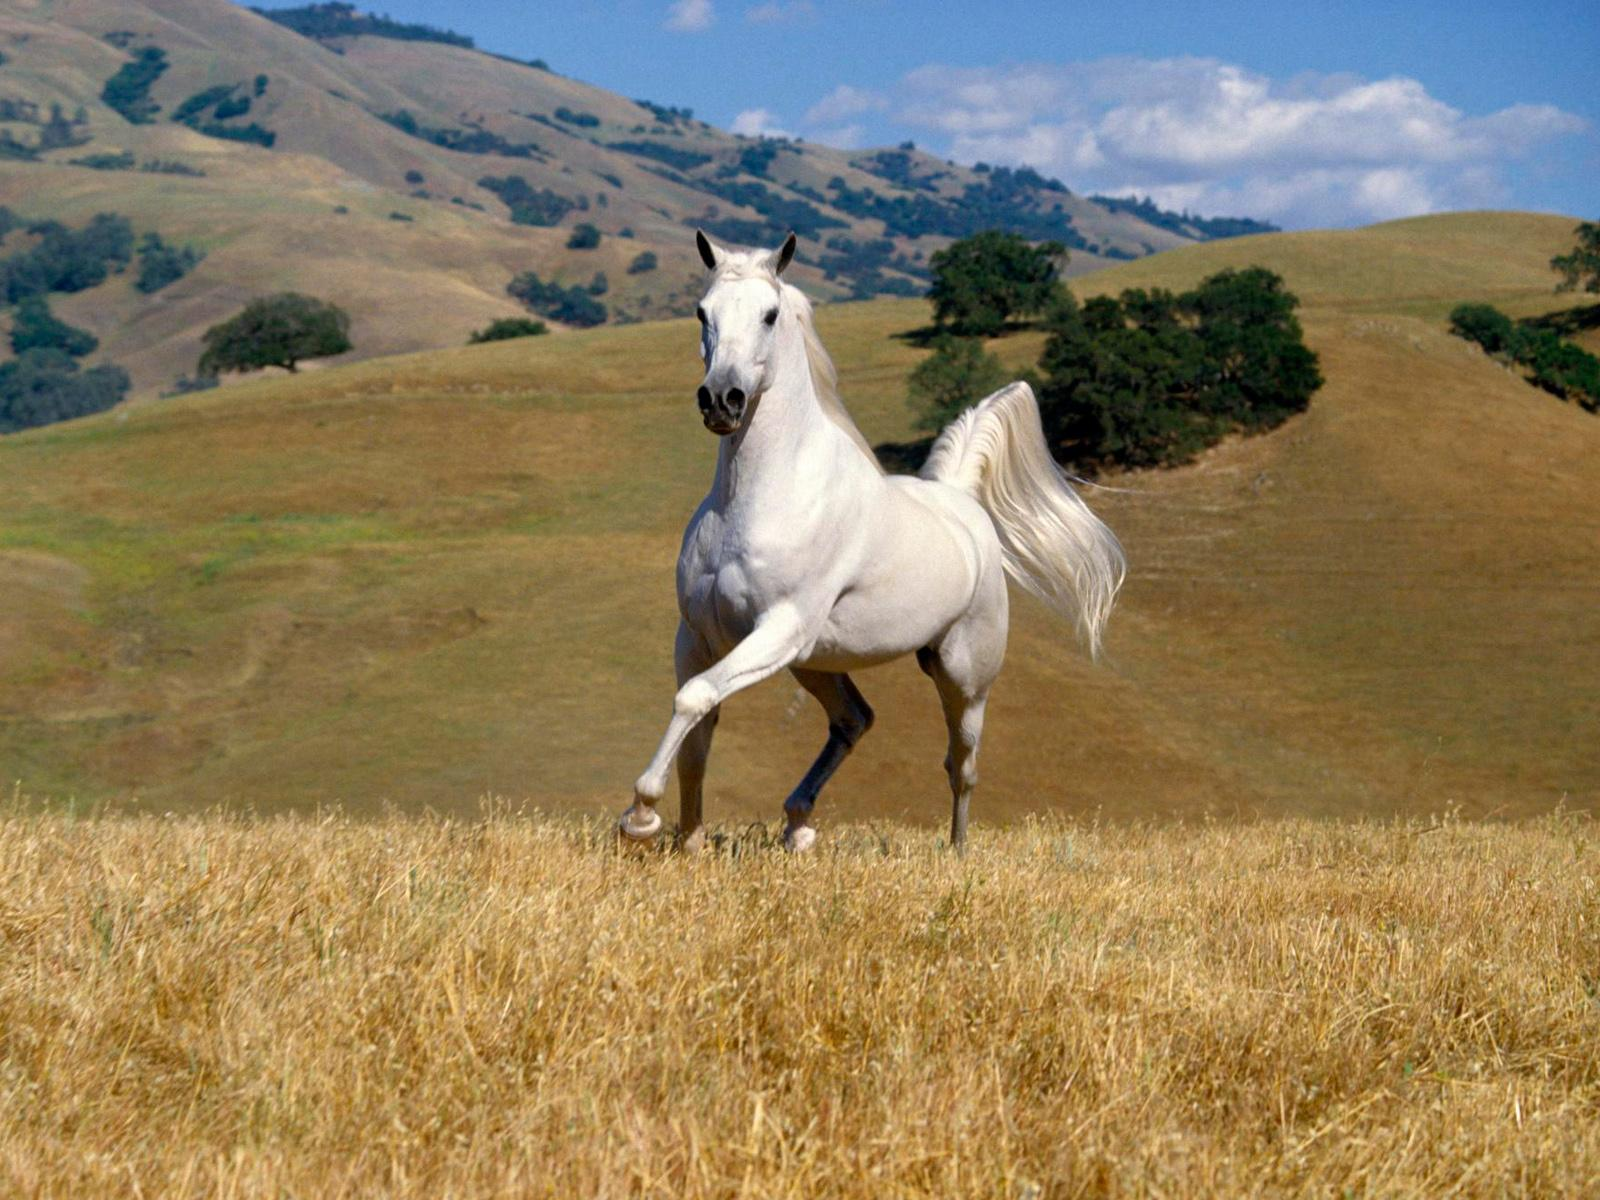 http://2.bp.blogspot.com/-ZadE9Frb5N4/TjOS626EOTI/AAAAAAAACrY/zgX2Q9gLOaA/s1600/beautiful-white-horse-wallpapers_10324_1600x1200.jpg